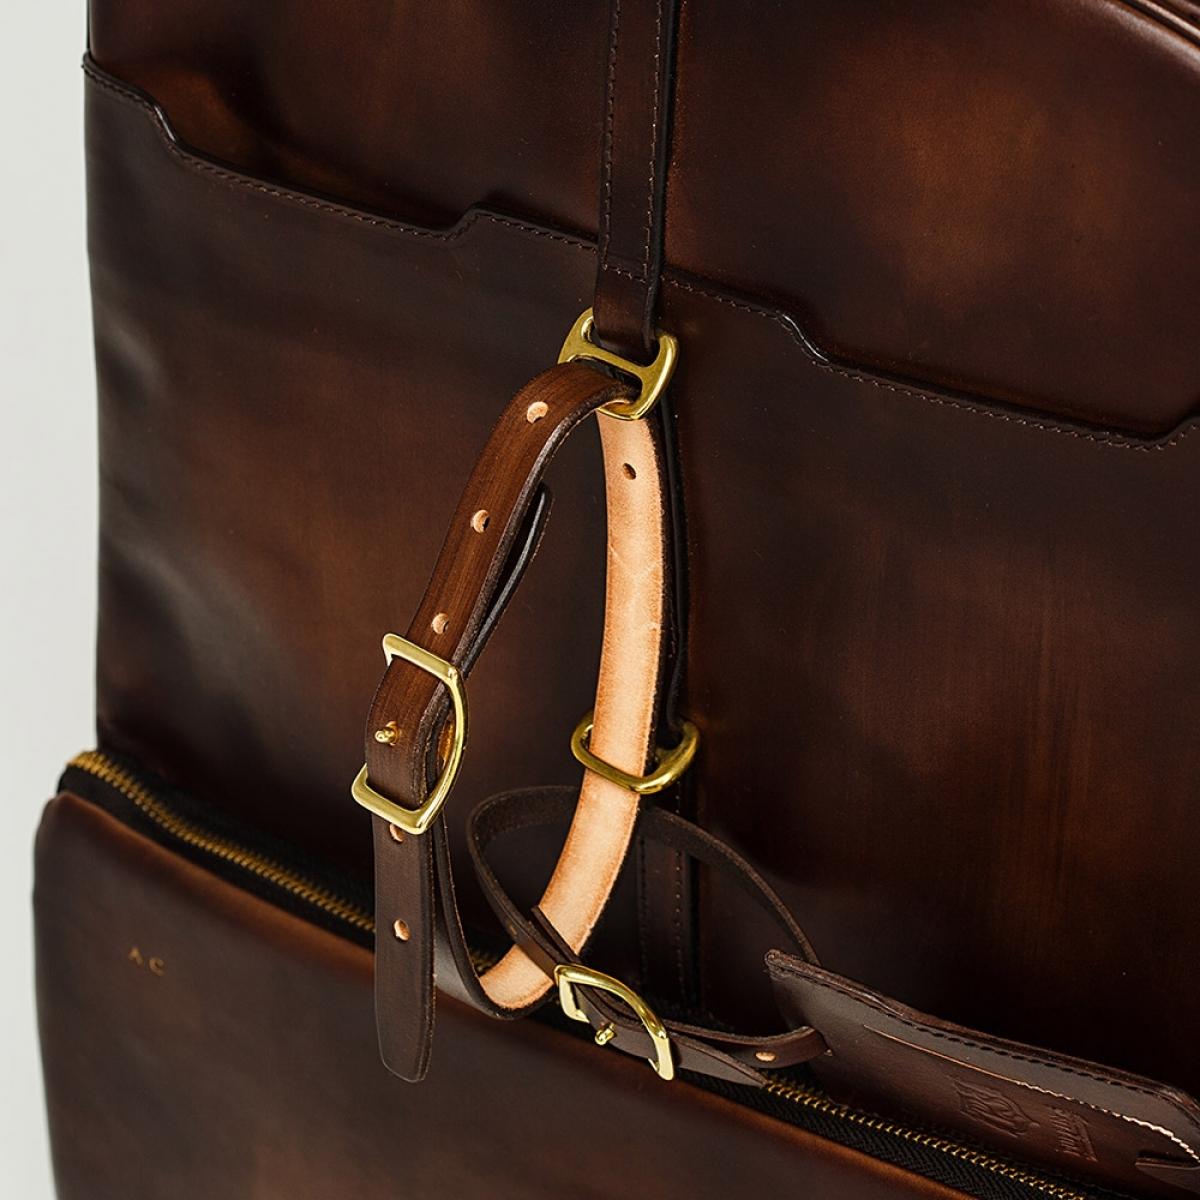 Backpack GRAN TURISMO 17''chestnut